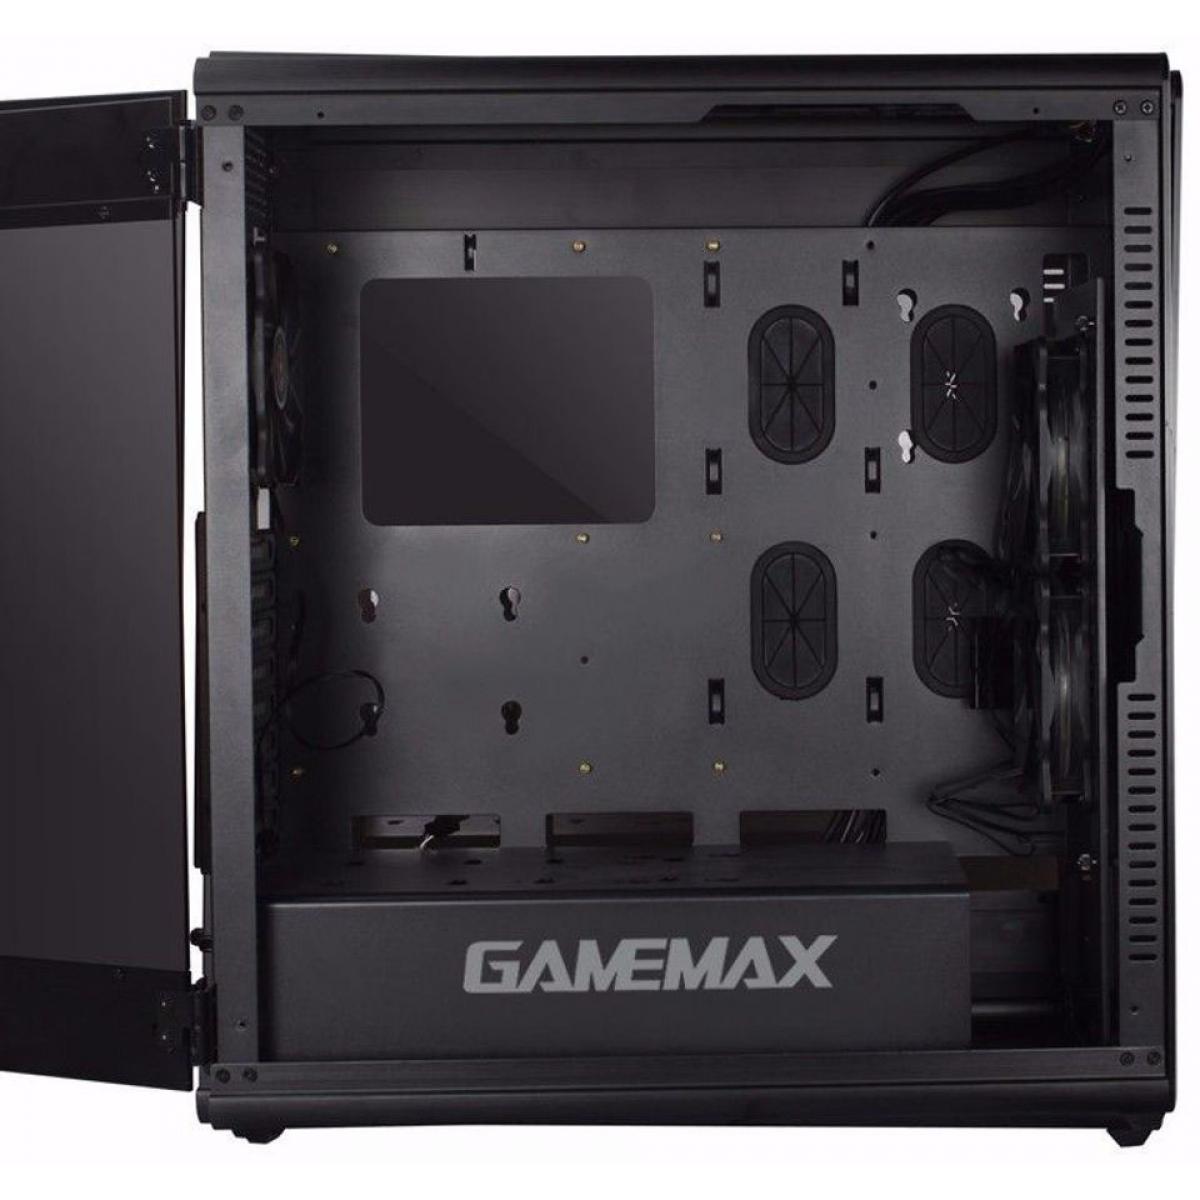 Gabinete Gamer Gamemax Raider X, Full Tower, Com 2 Fans, Lateral em Acrílico, Black, S-Fonte